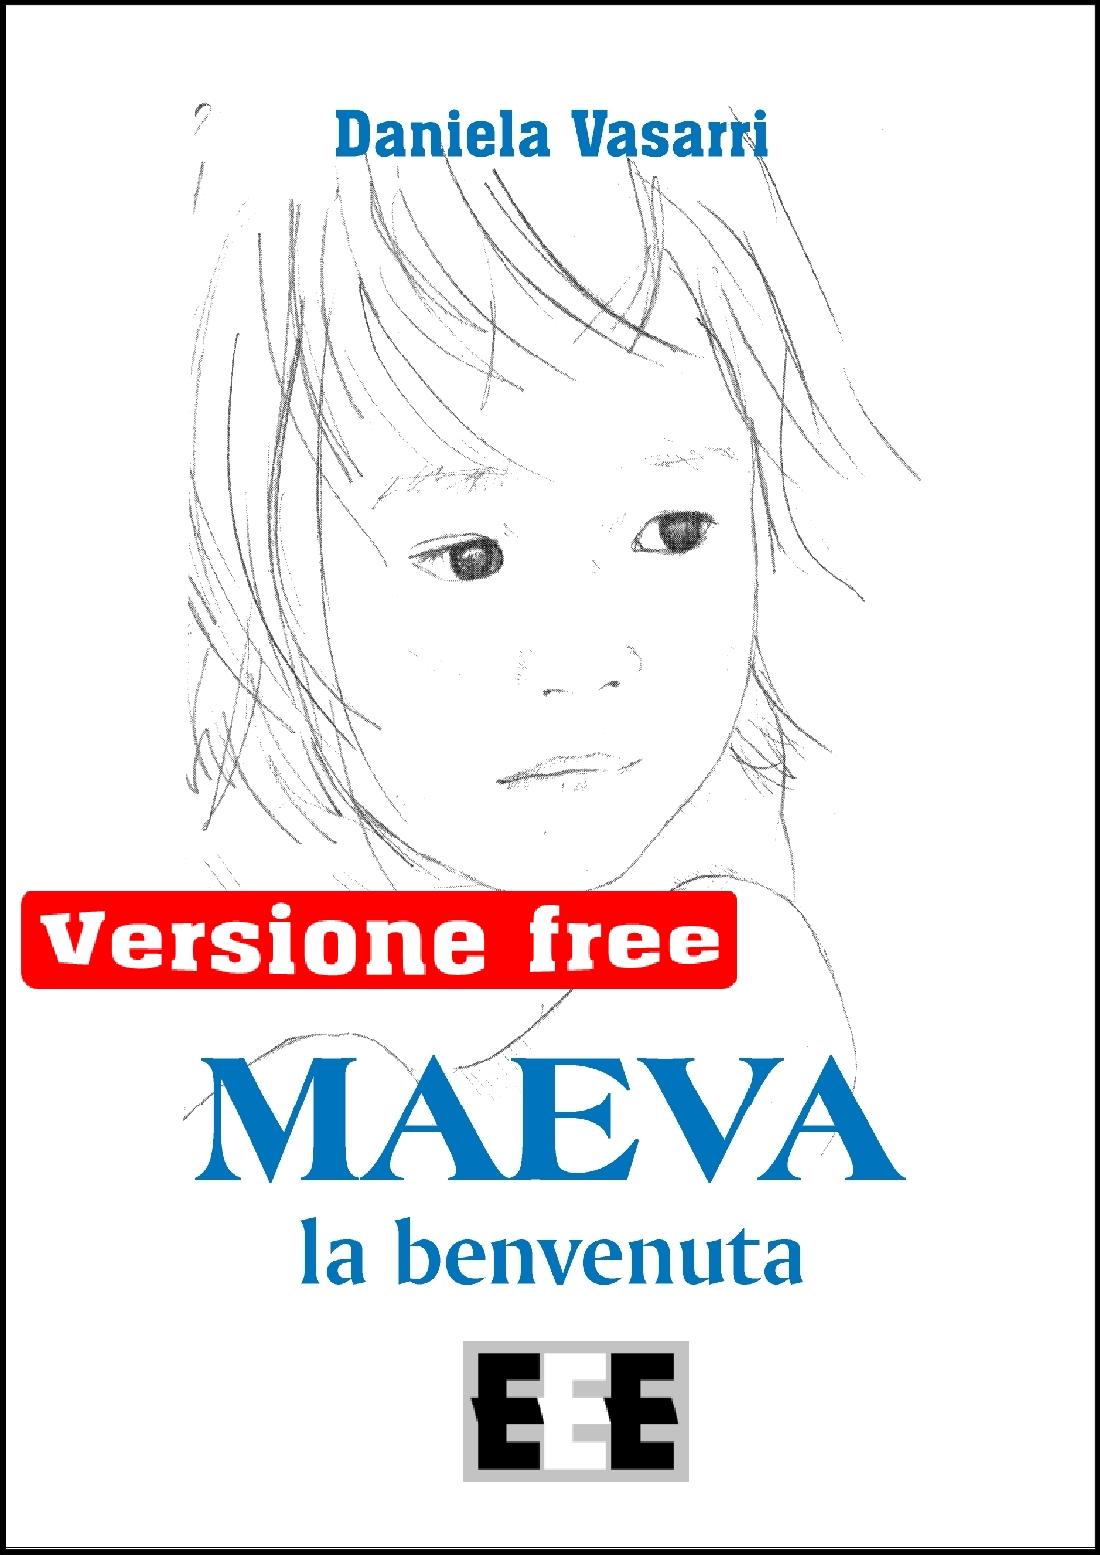 MAEVA_VASARRI_FREE